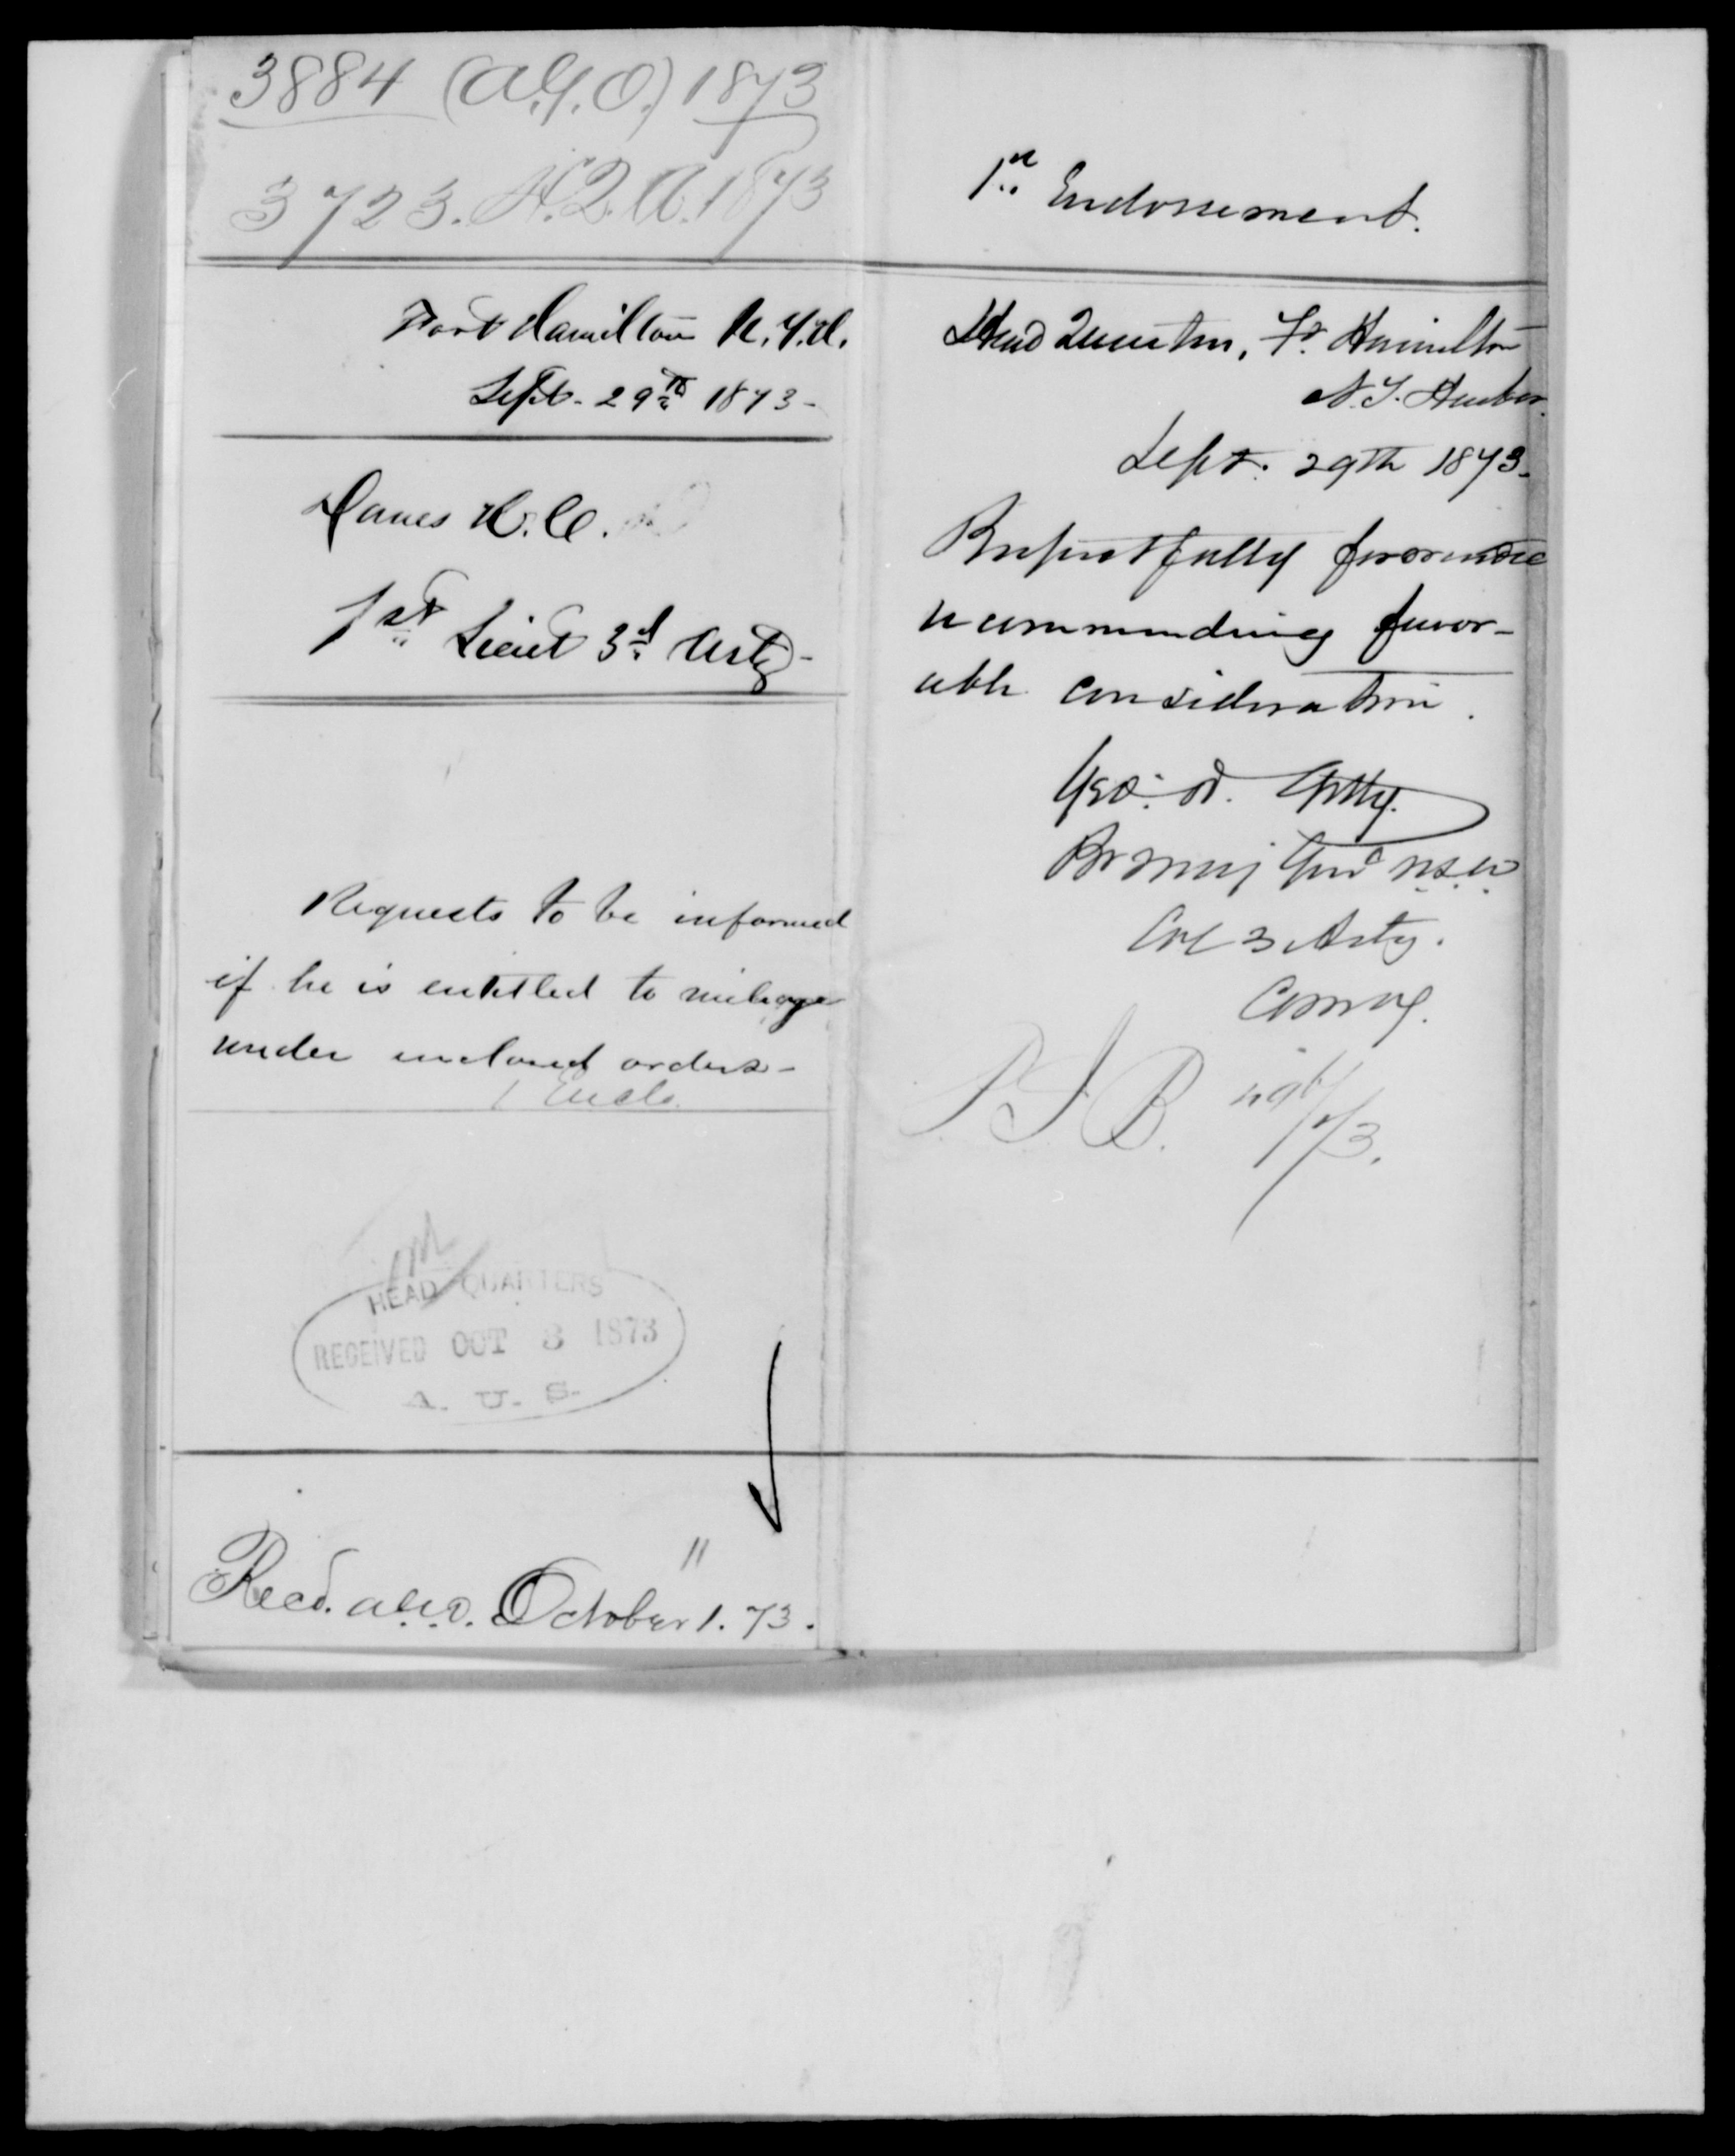 1873 - File No. 3884 (Danes, H C - New York)